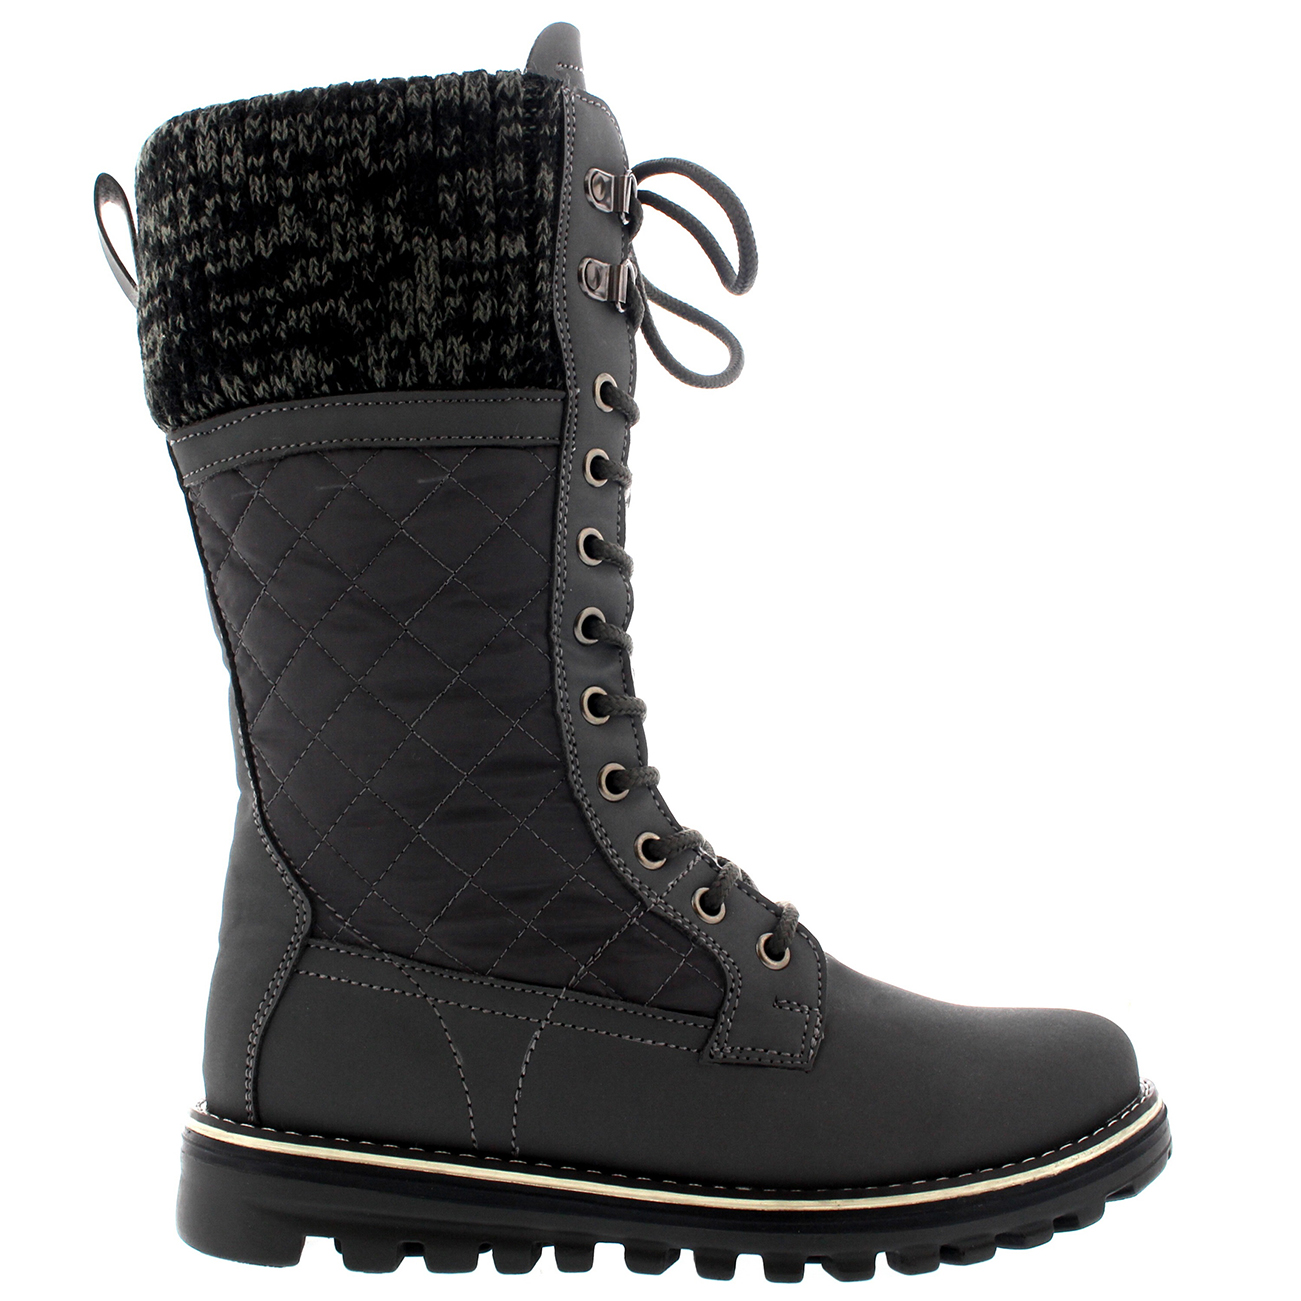 Sorel Ladies Wedge Boots